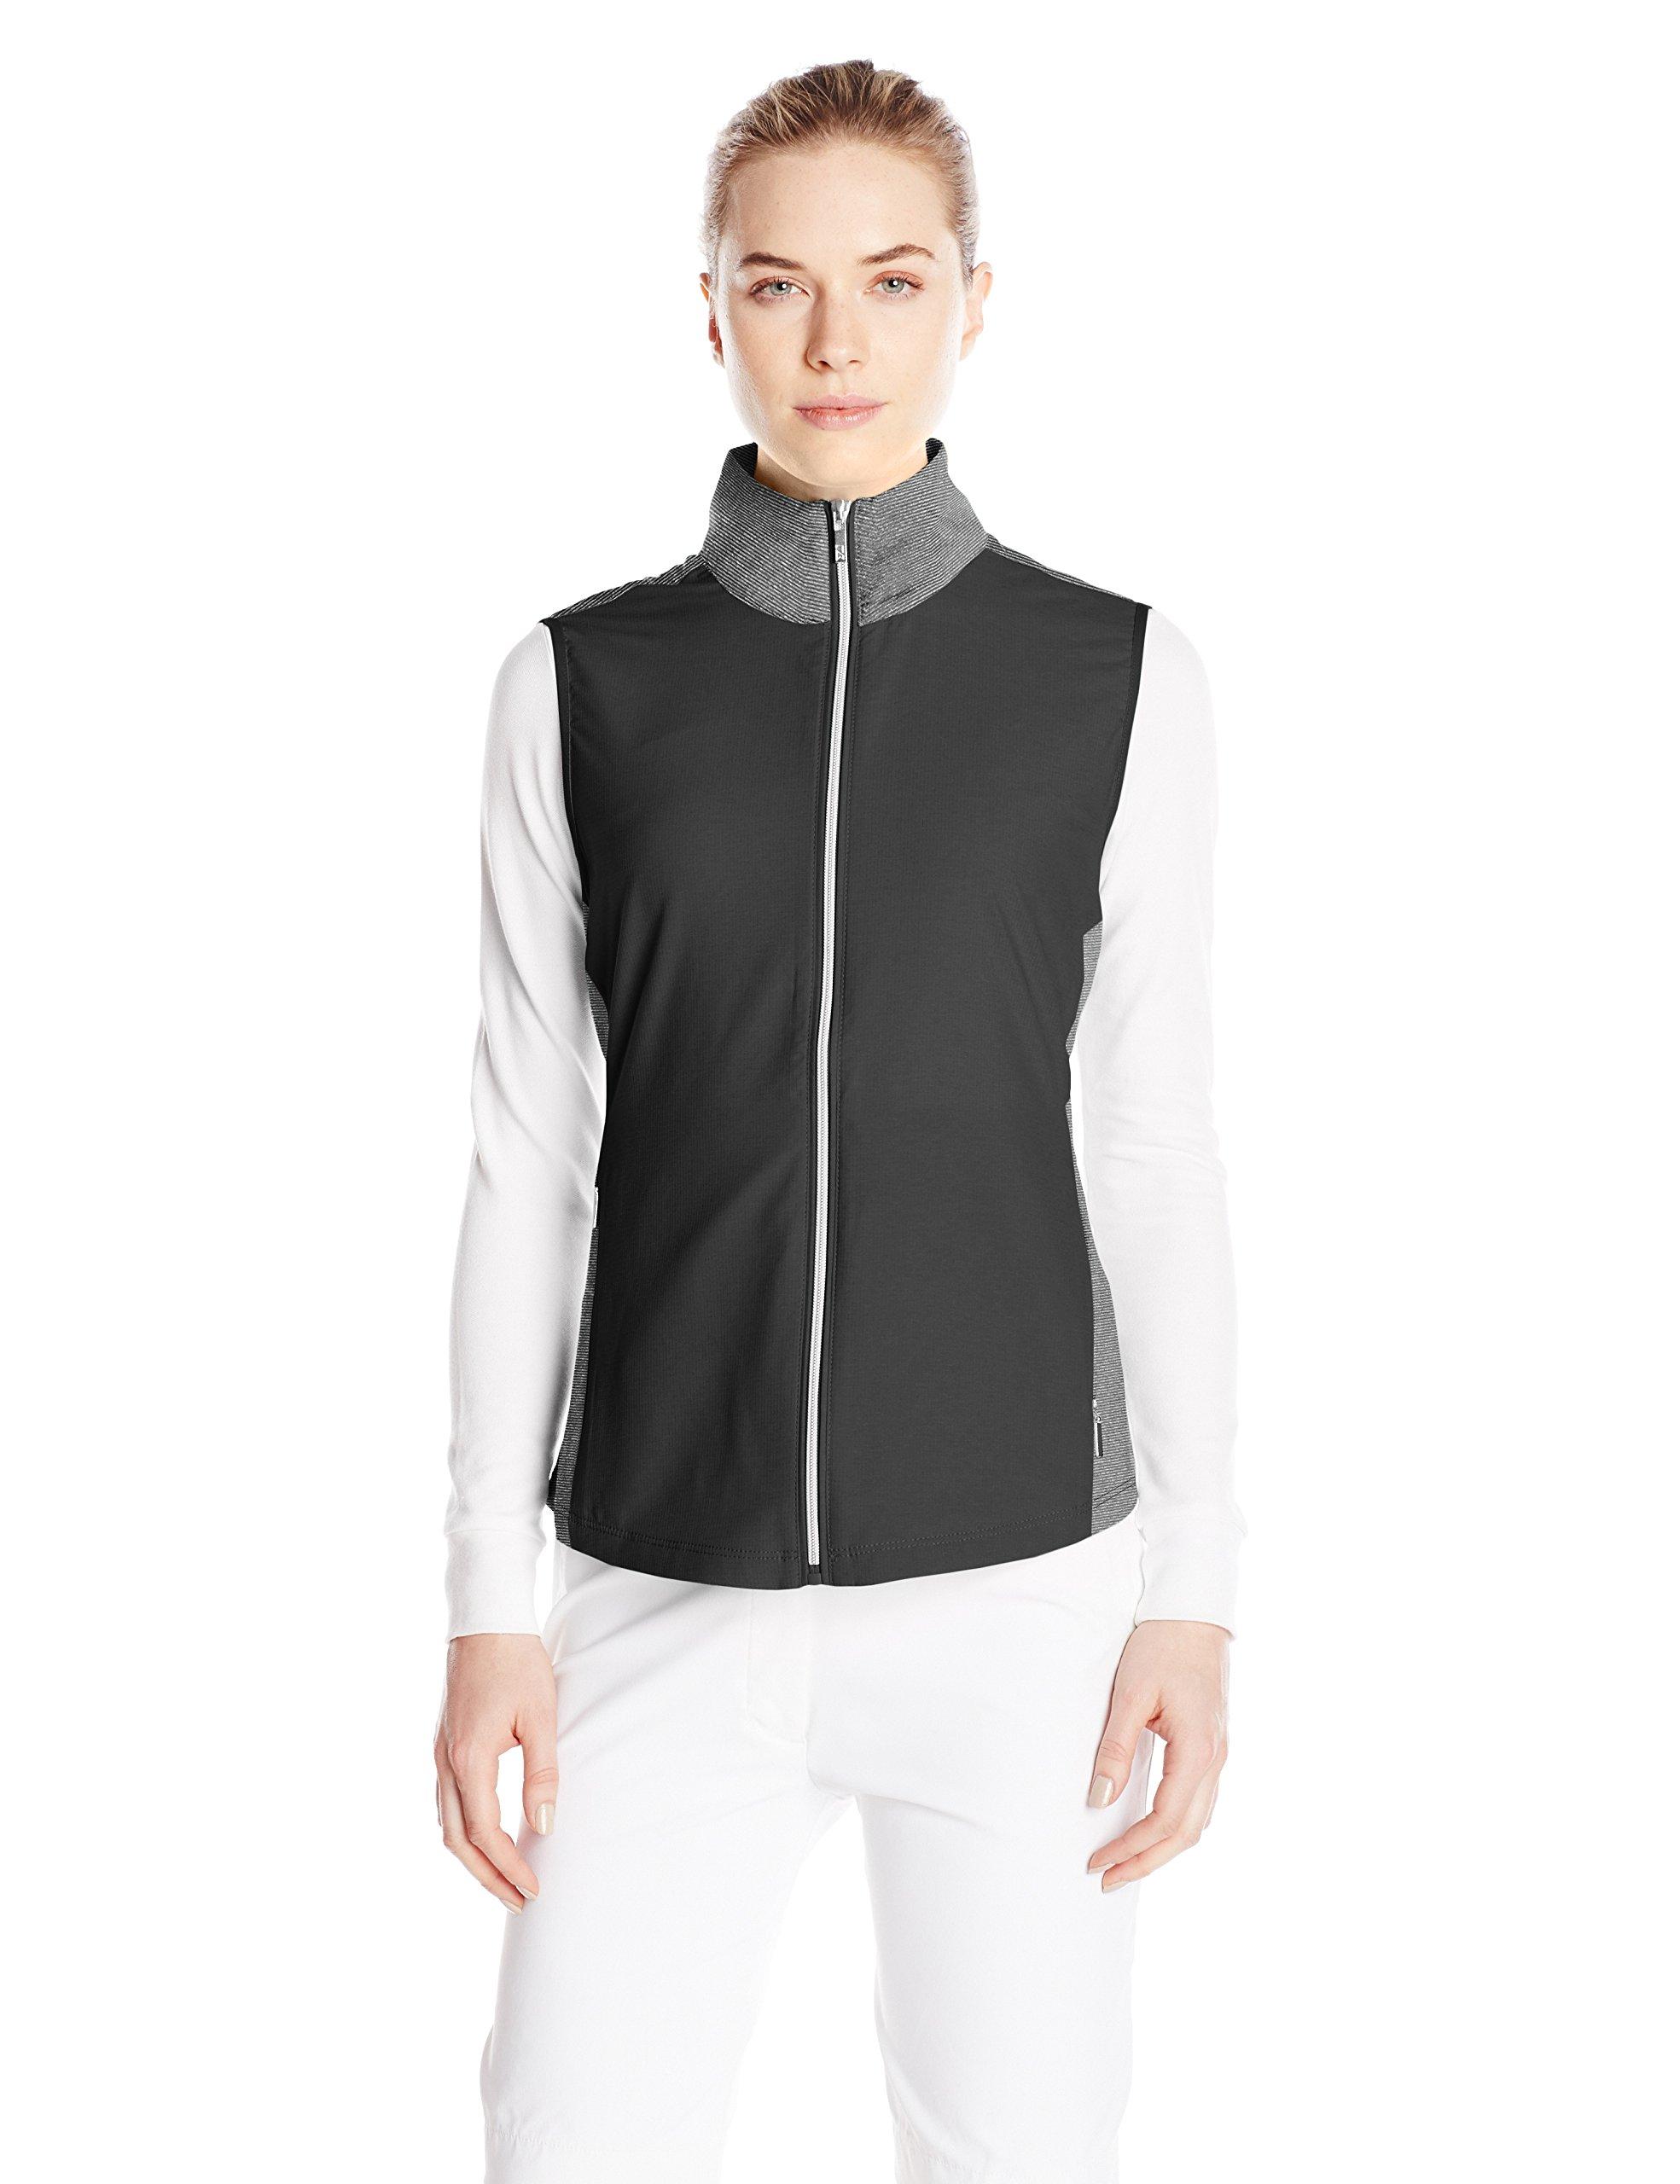 Cutter & Buck Women's CB Weathertec Laura Hybrid Vest, Black, X-Small